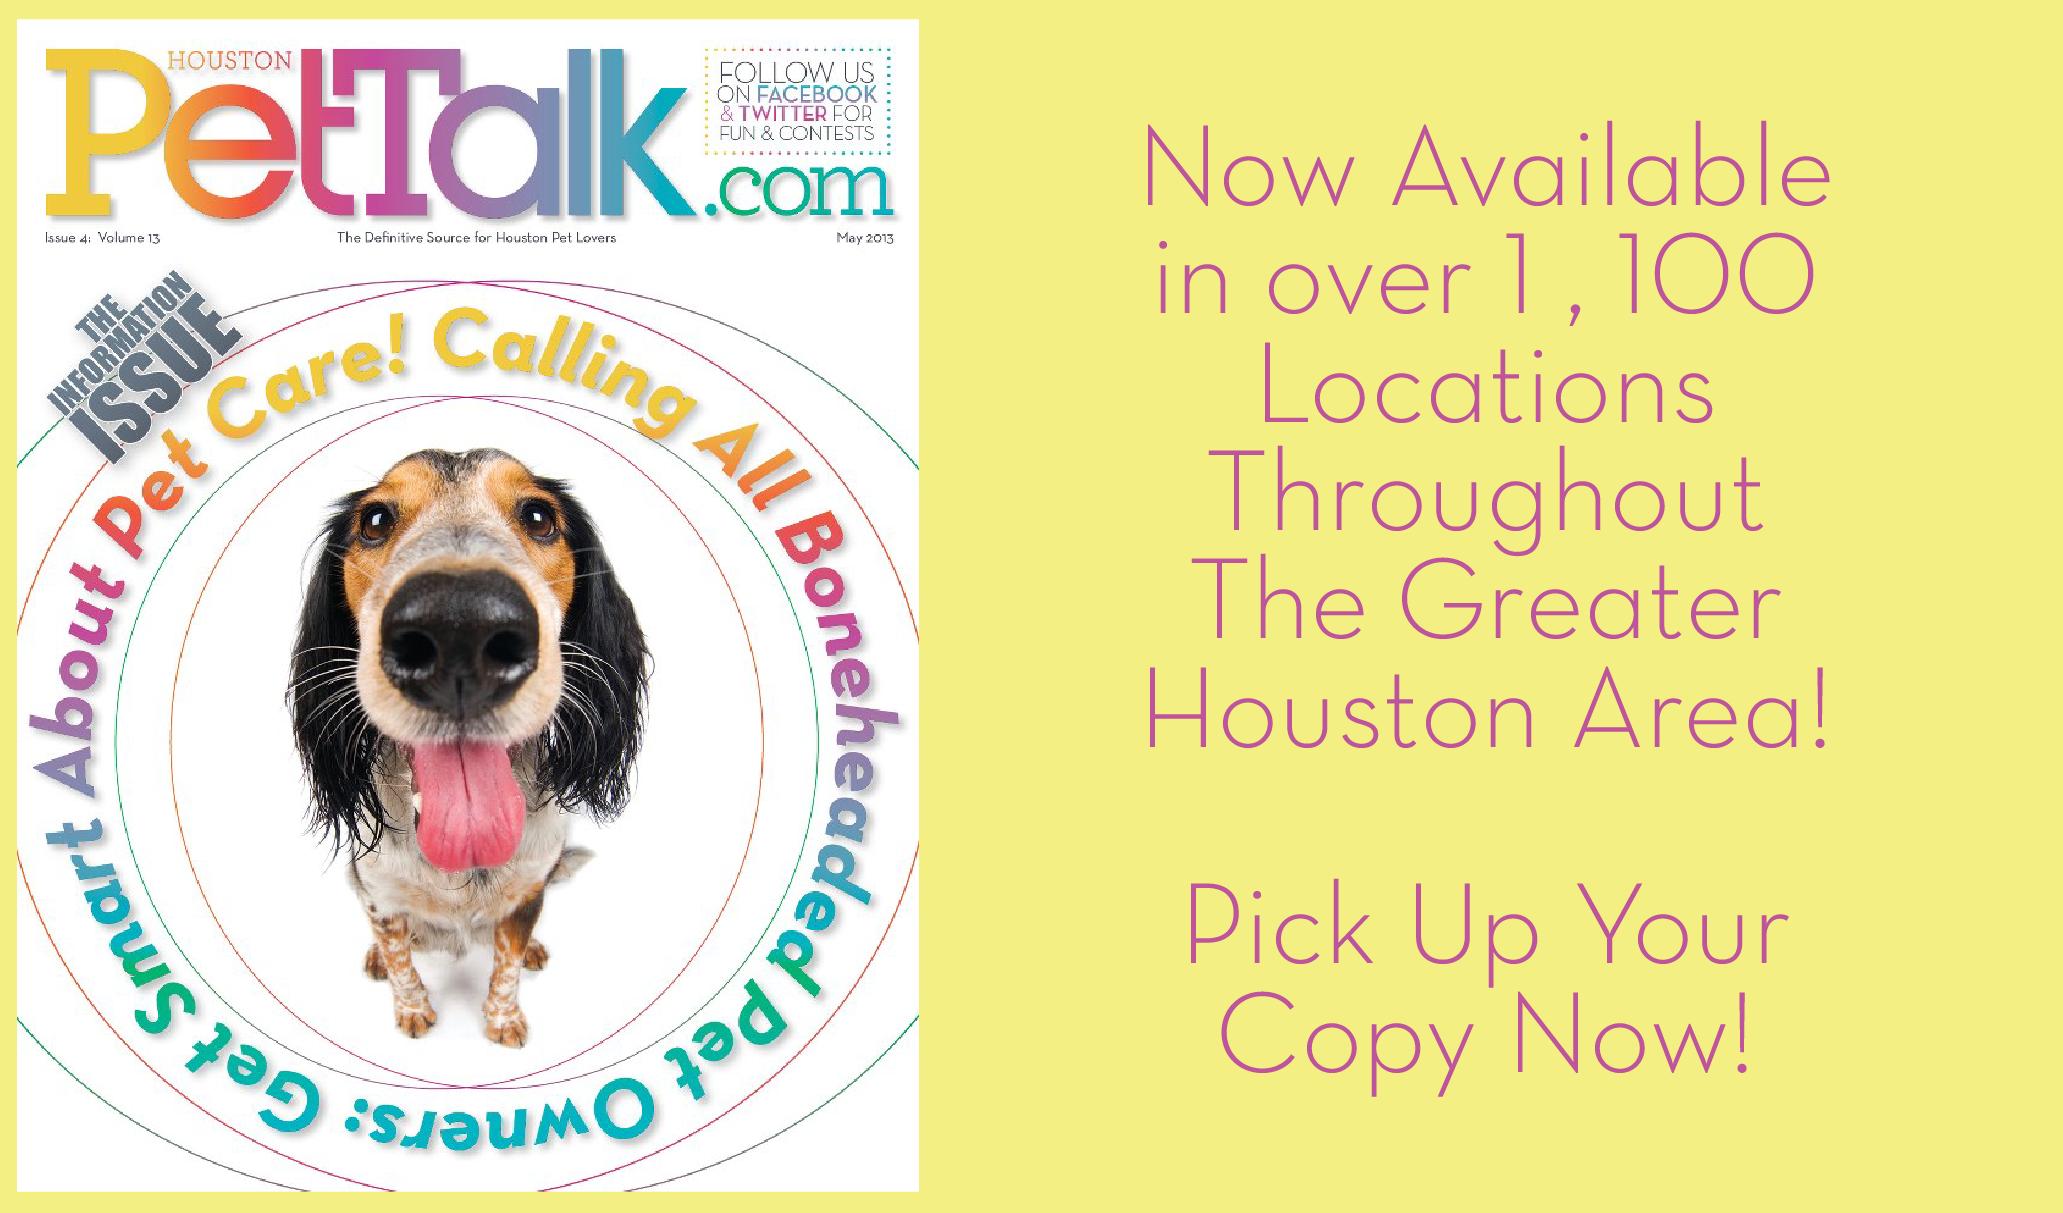 May 2013 Digital Issue of Houston PetTalk